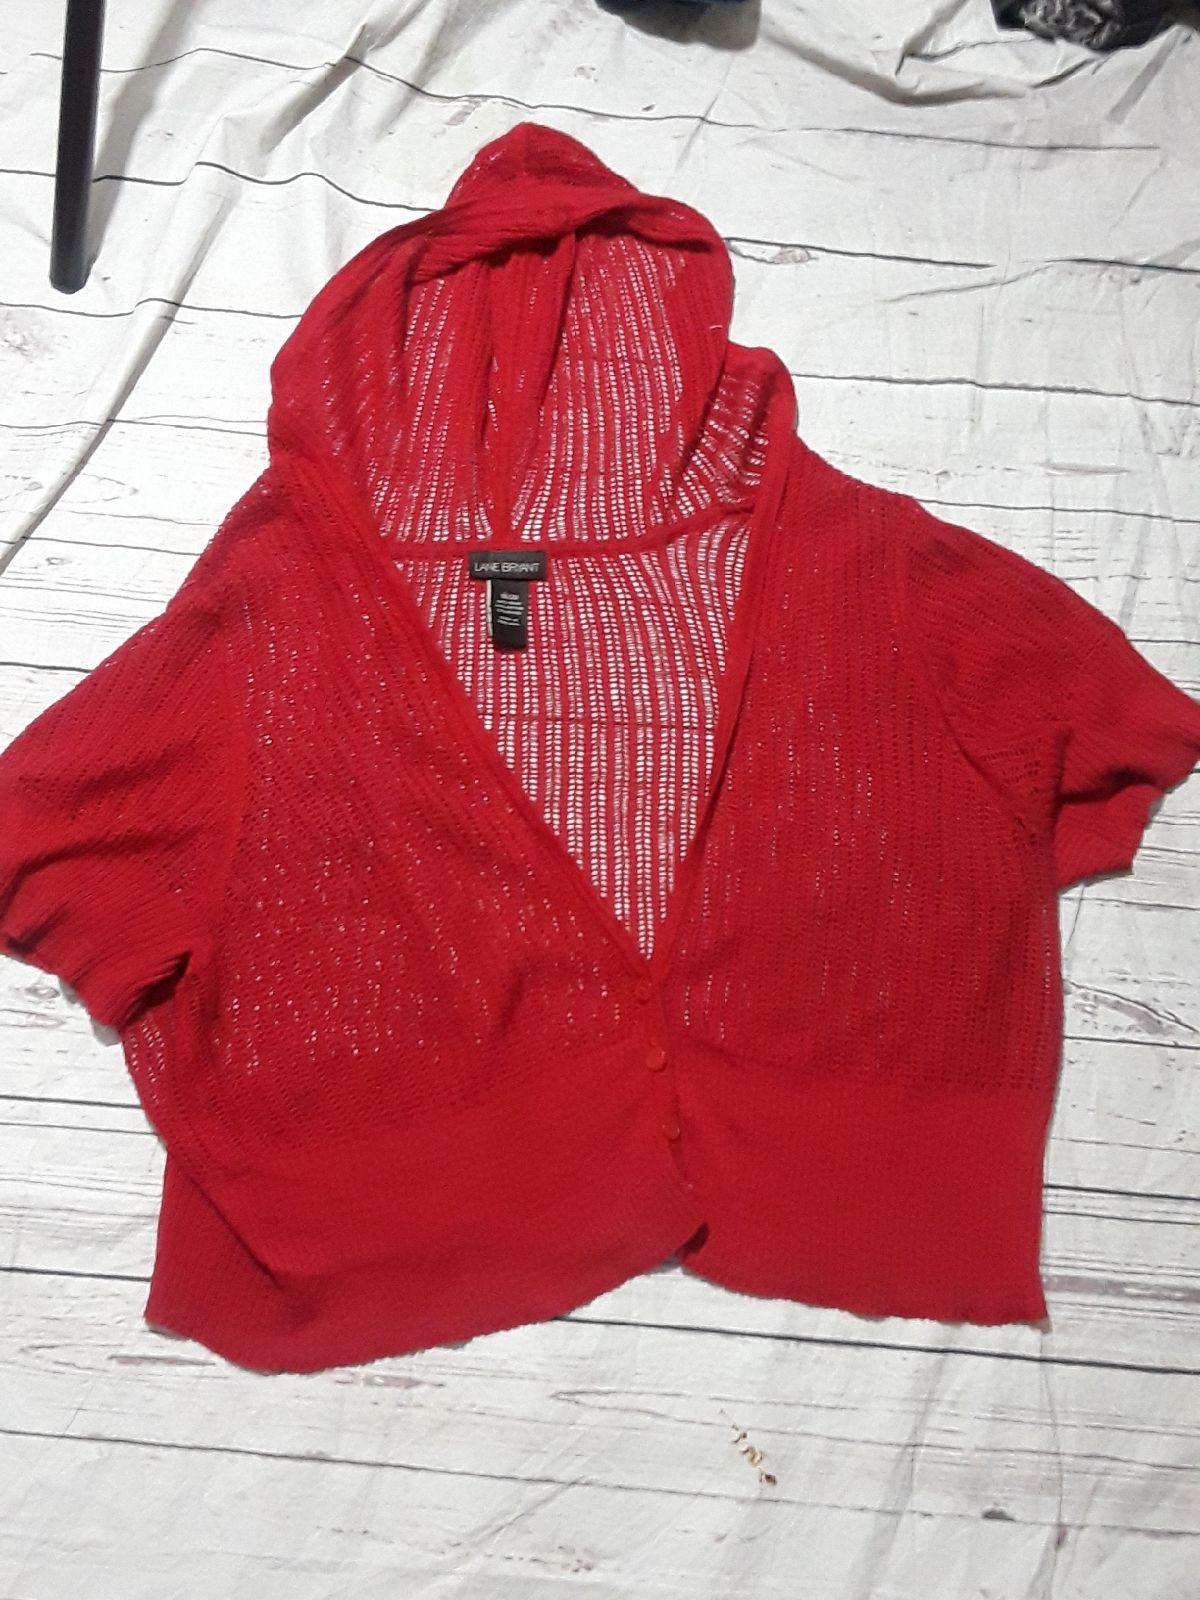 Lane Bryant red hooded sweater /shrug - Mercari: BUY & SELL THINGS ...